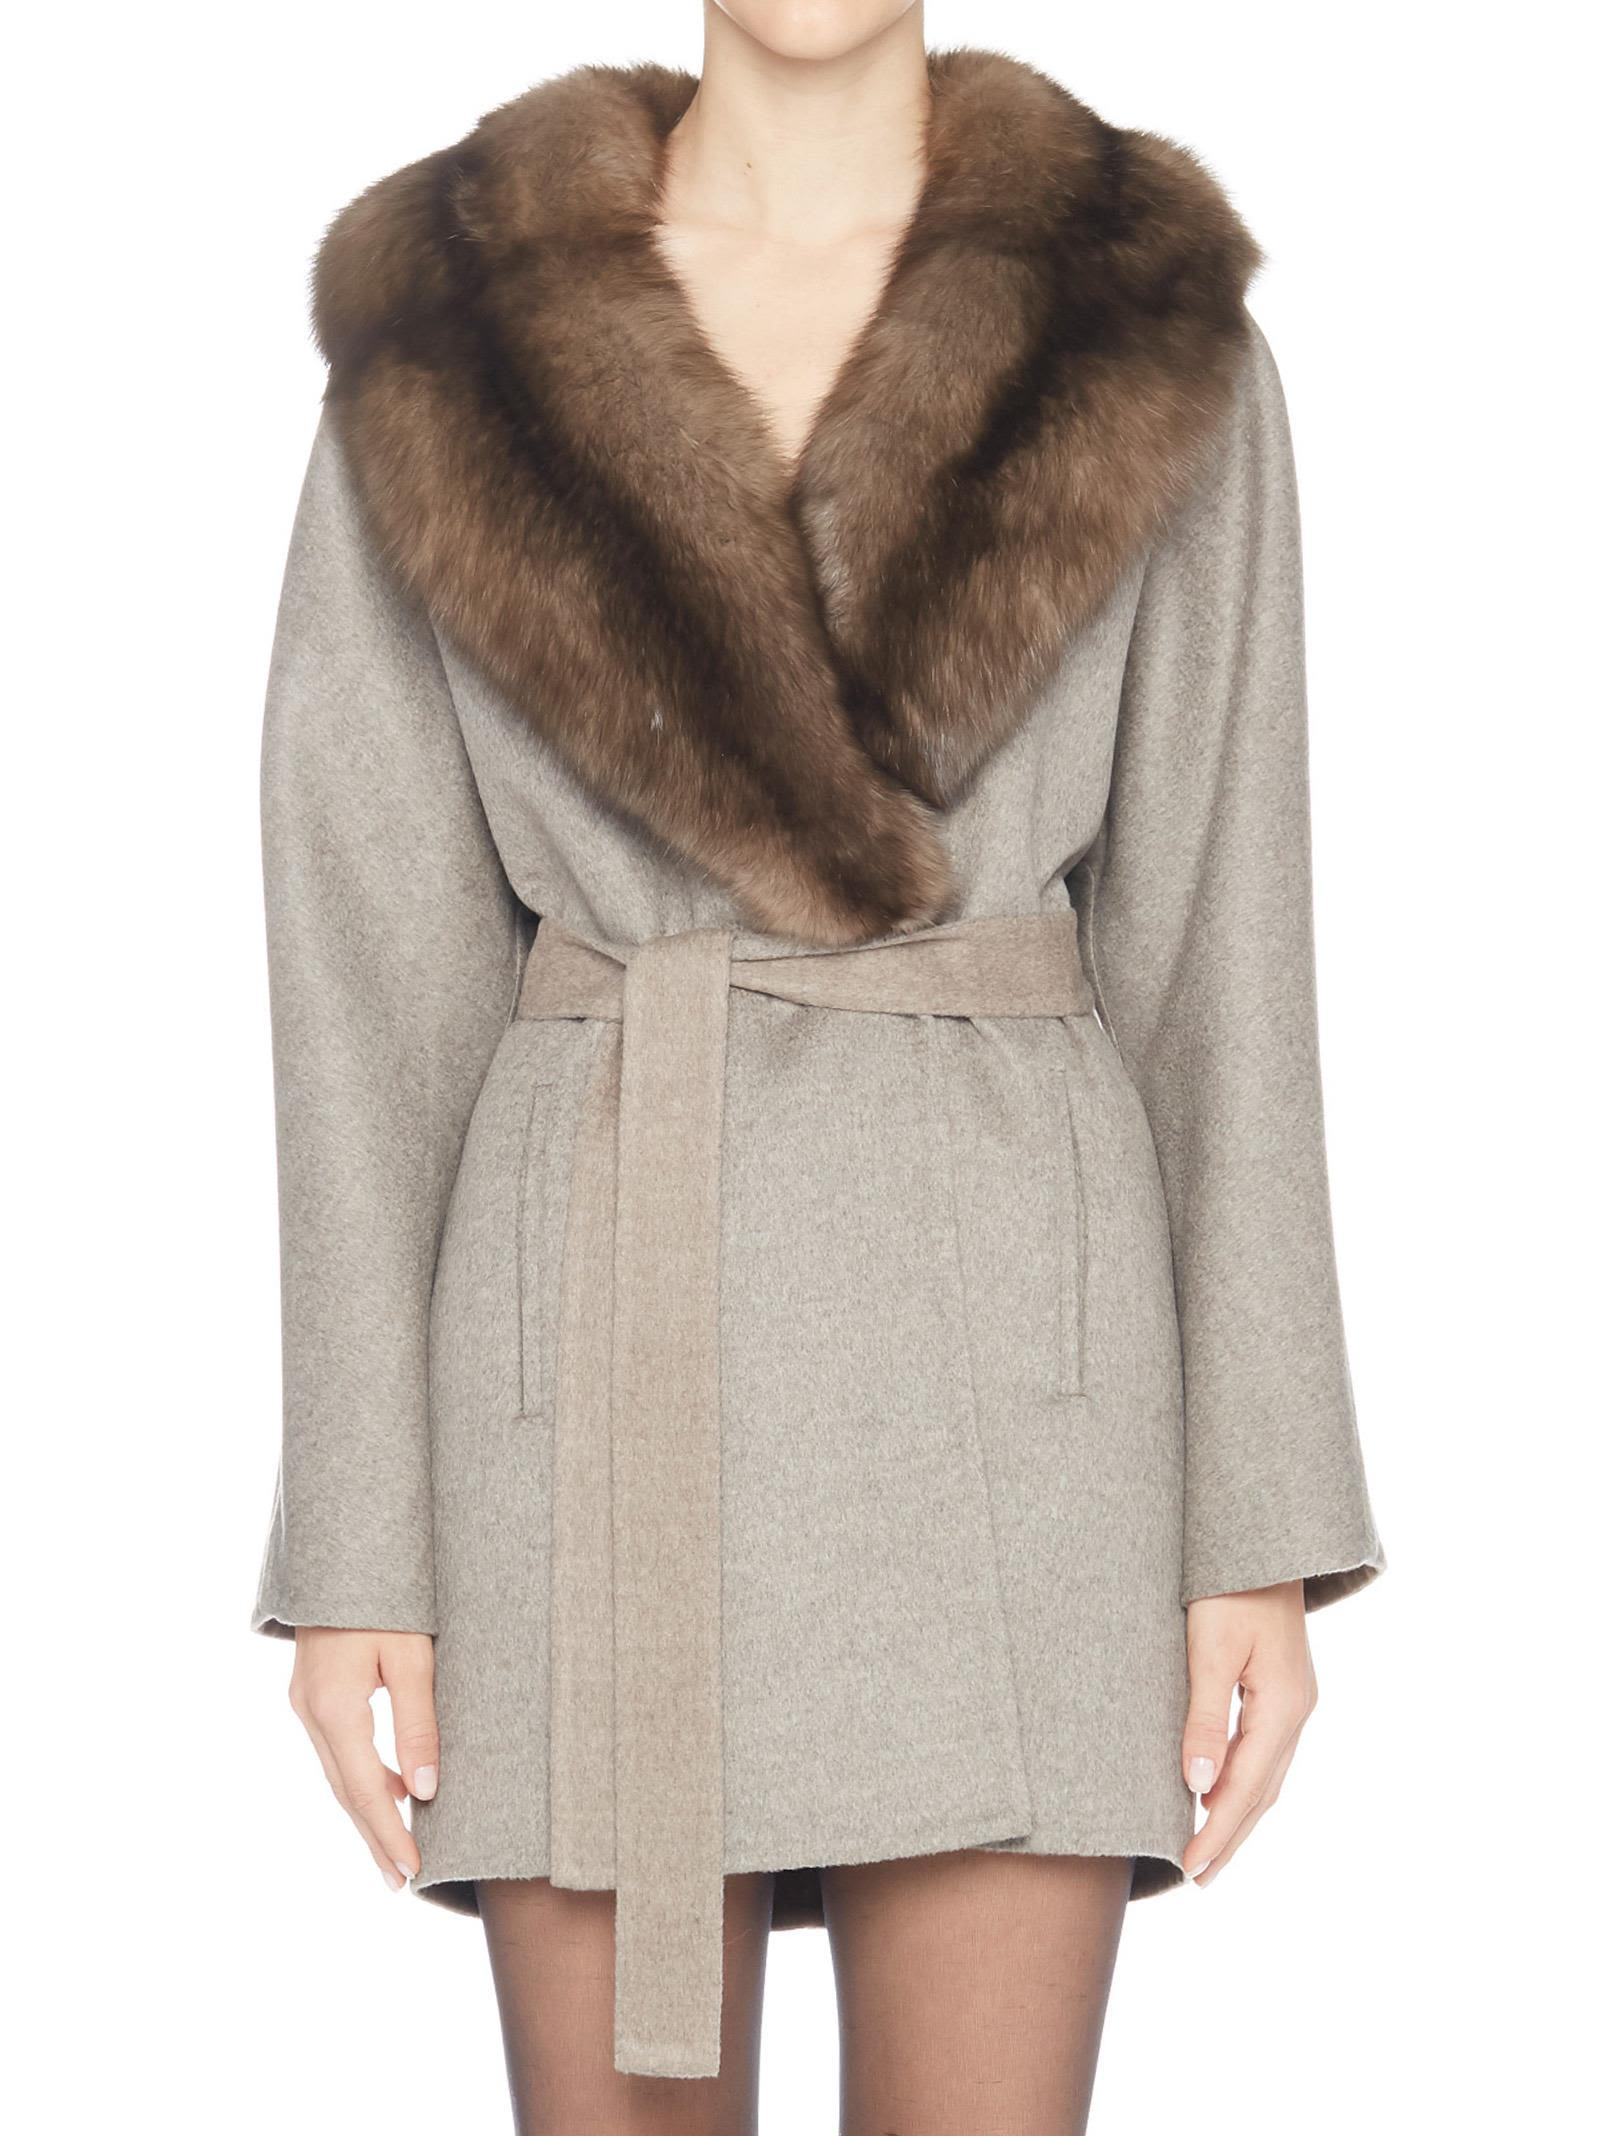 GIULIANA TESO Coat in Brown